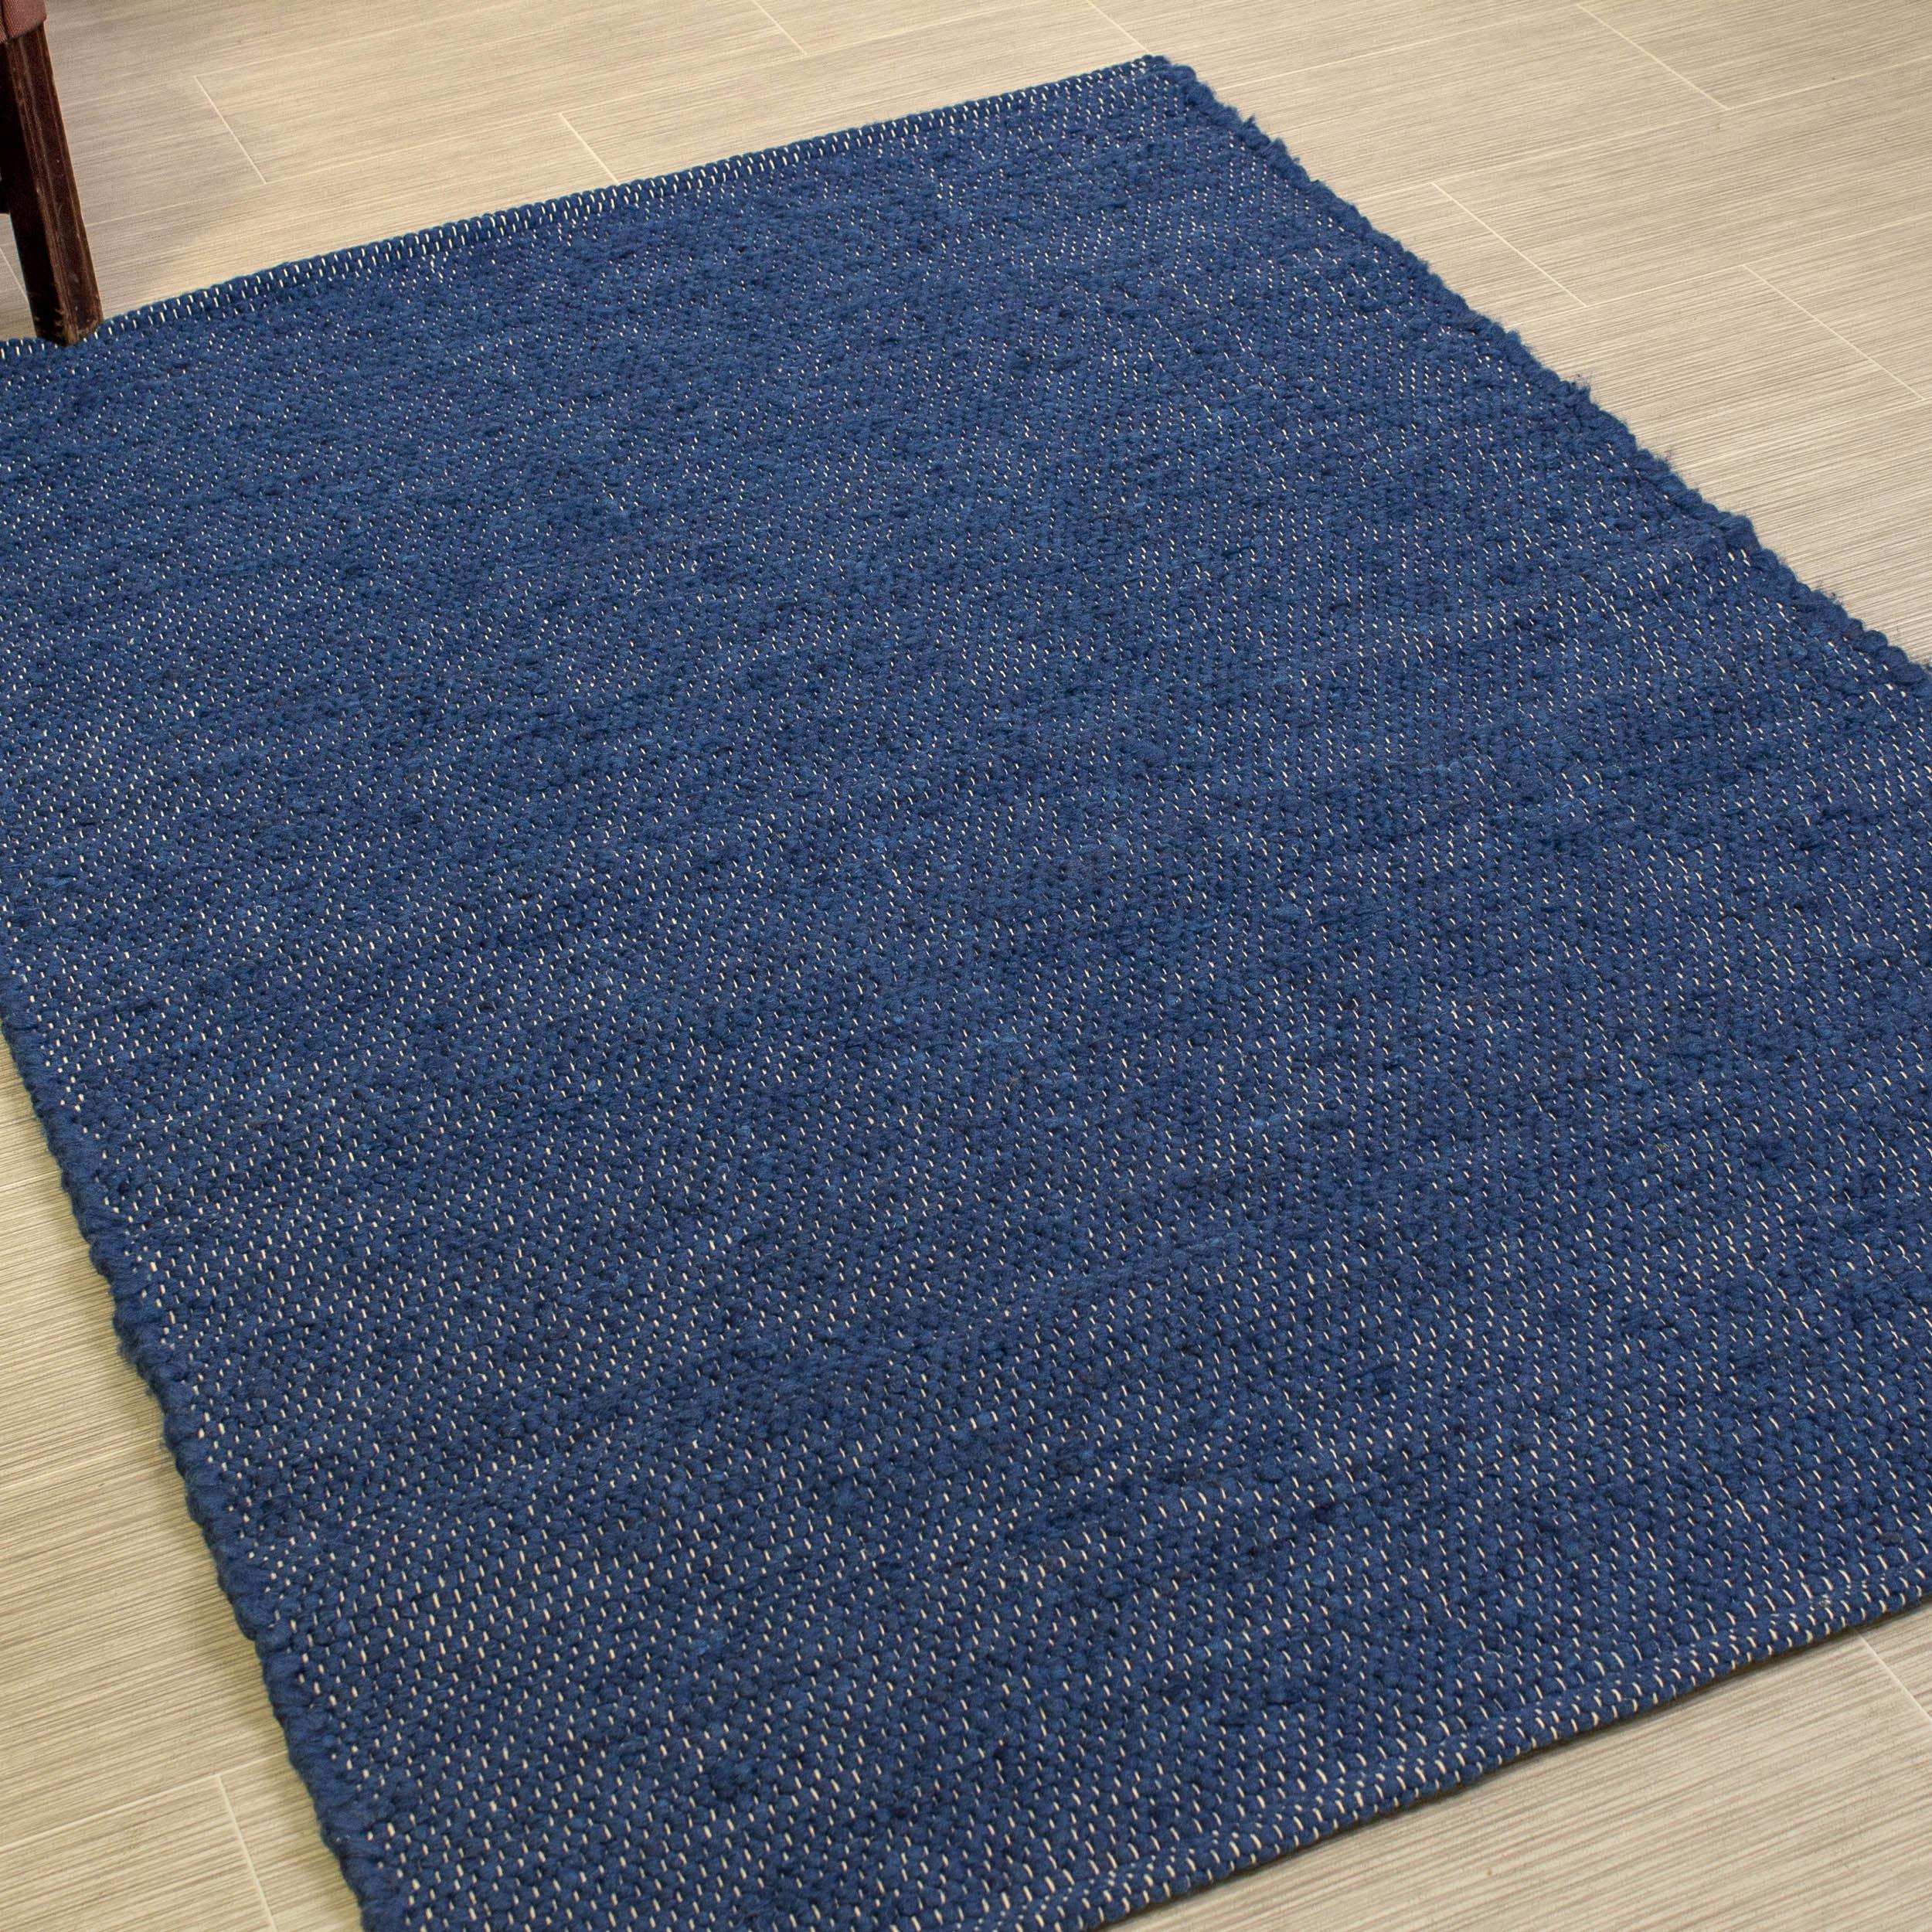 Herndon Handmade Braided Navy Blue